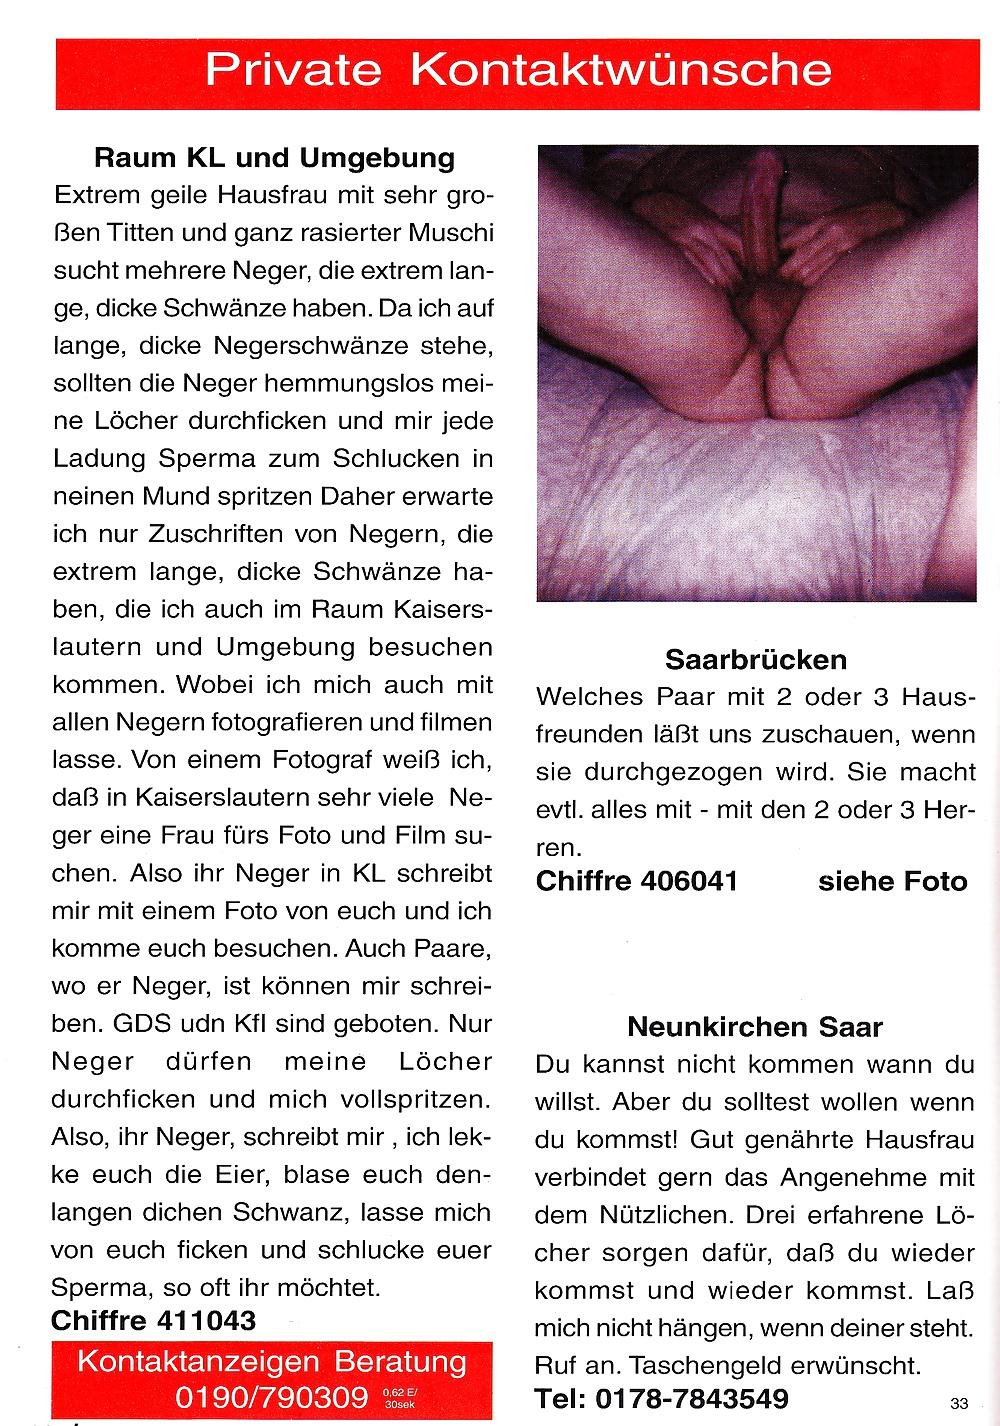 Abschlussvideo chastity kg penis cage foto wettbewerb - 1 part 5